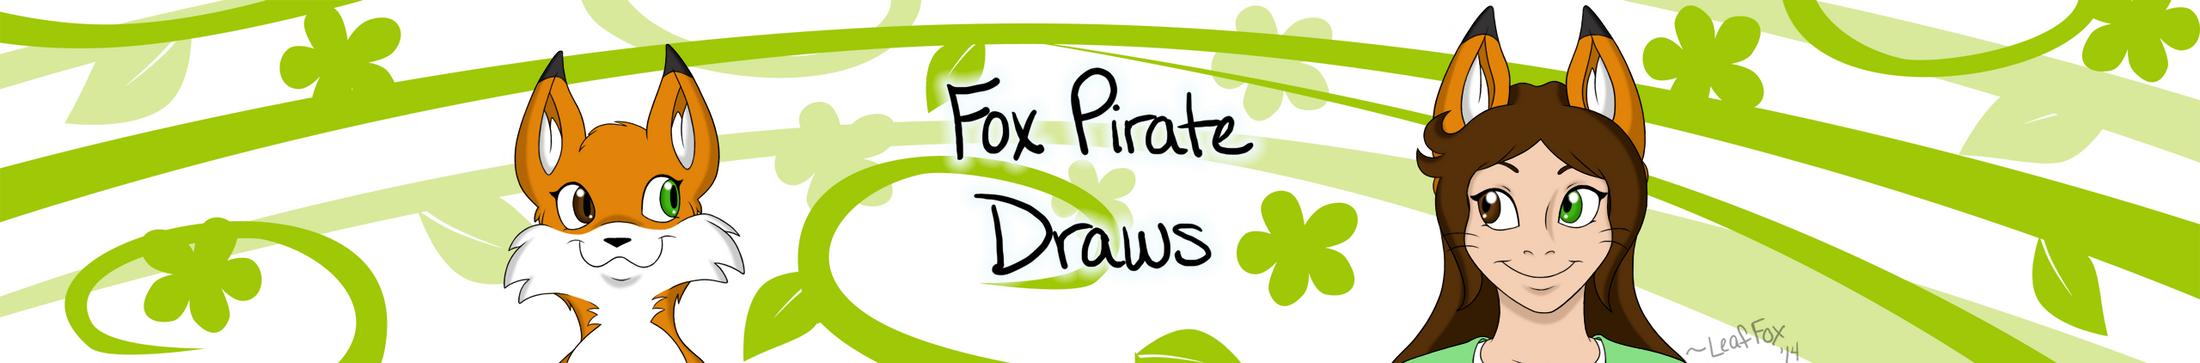 FoxPirate Draws Logo